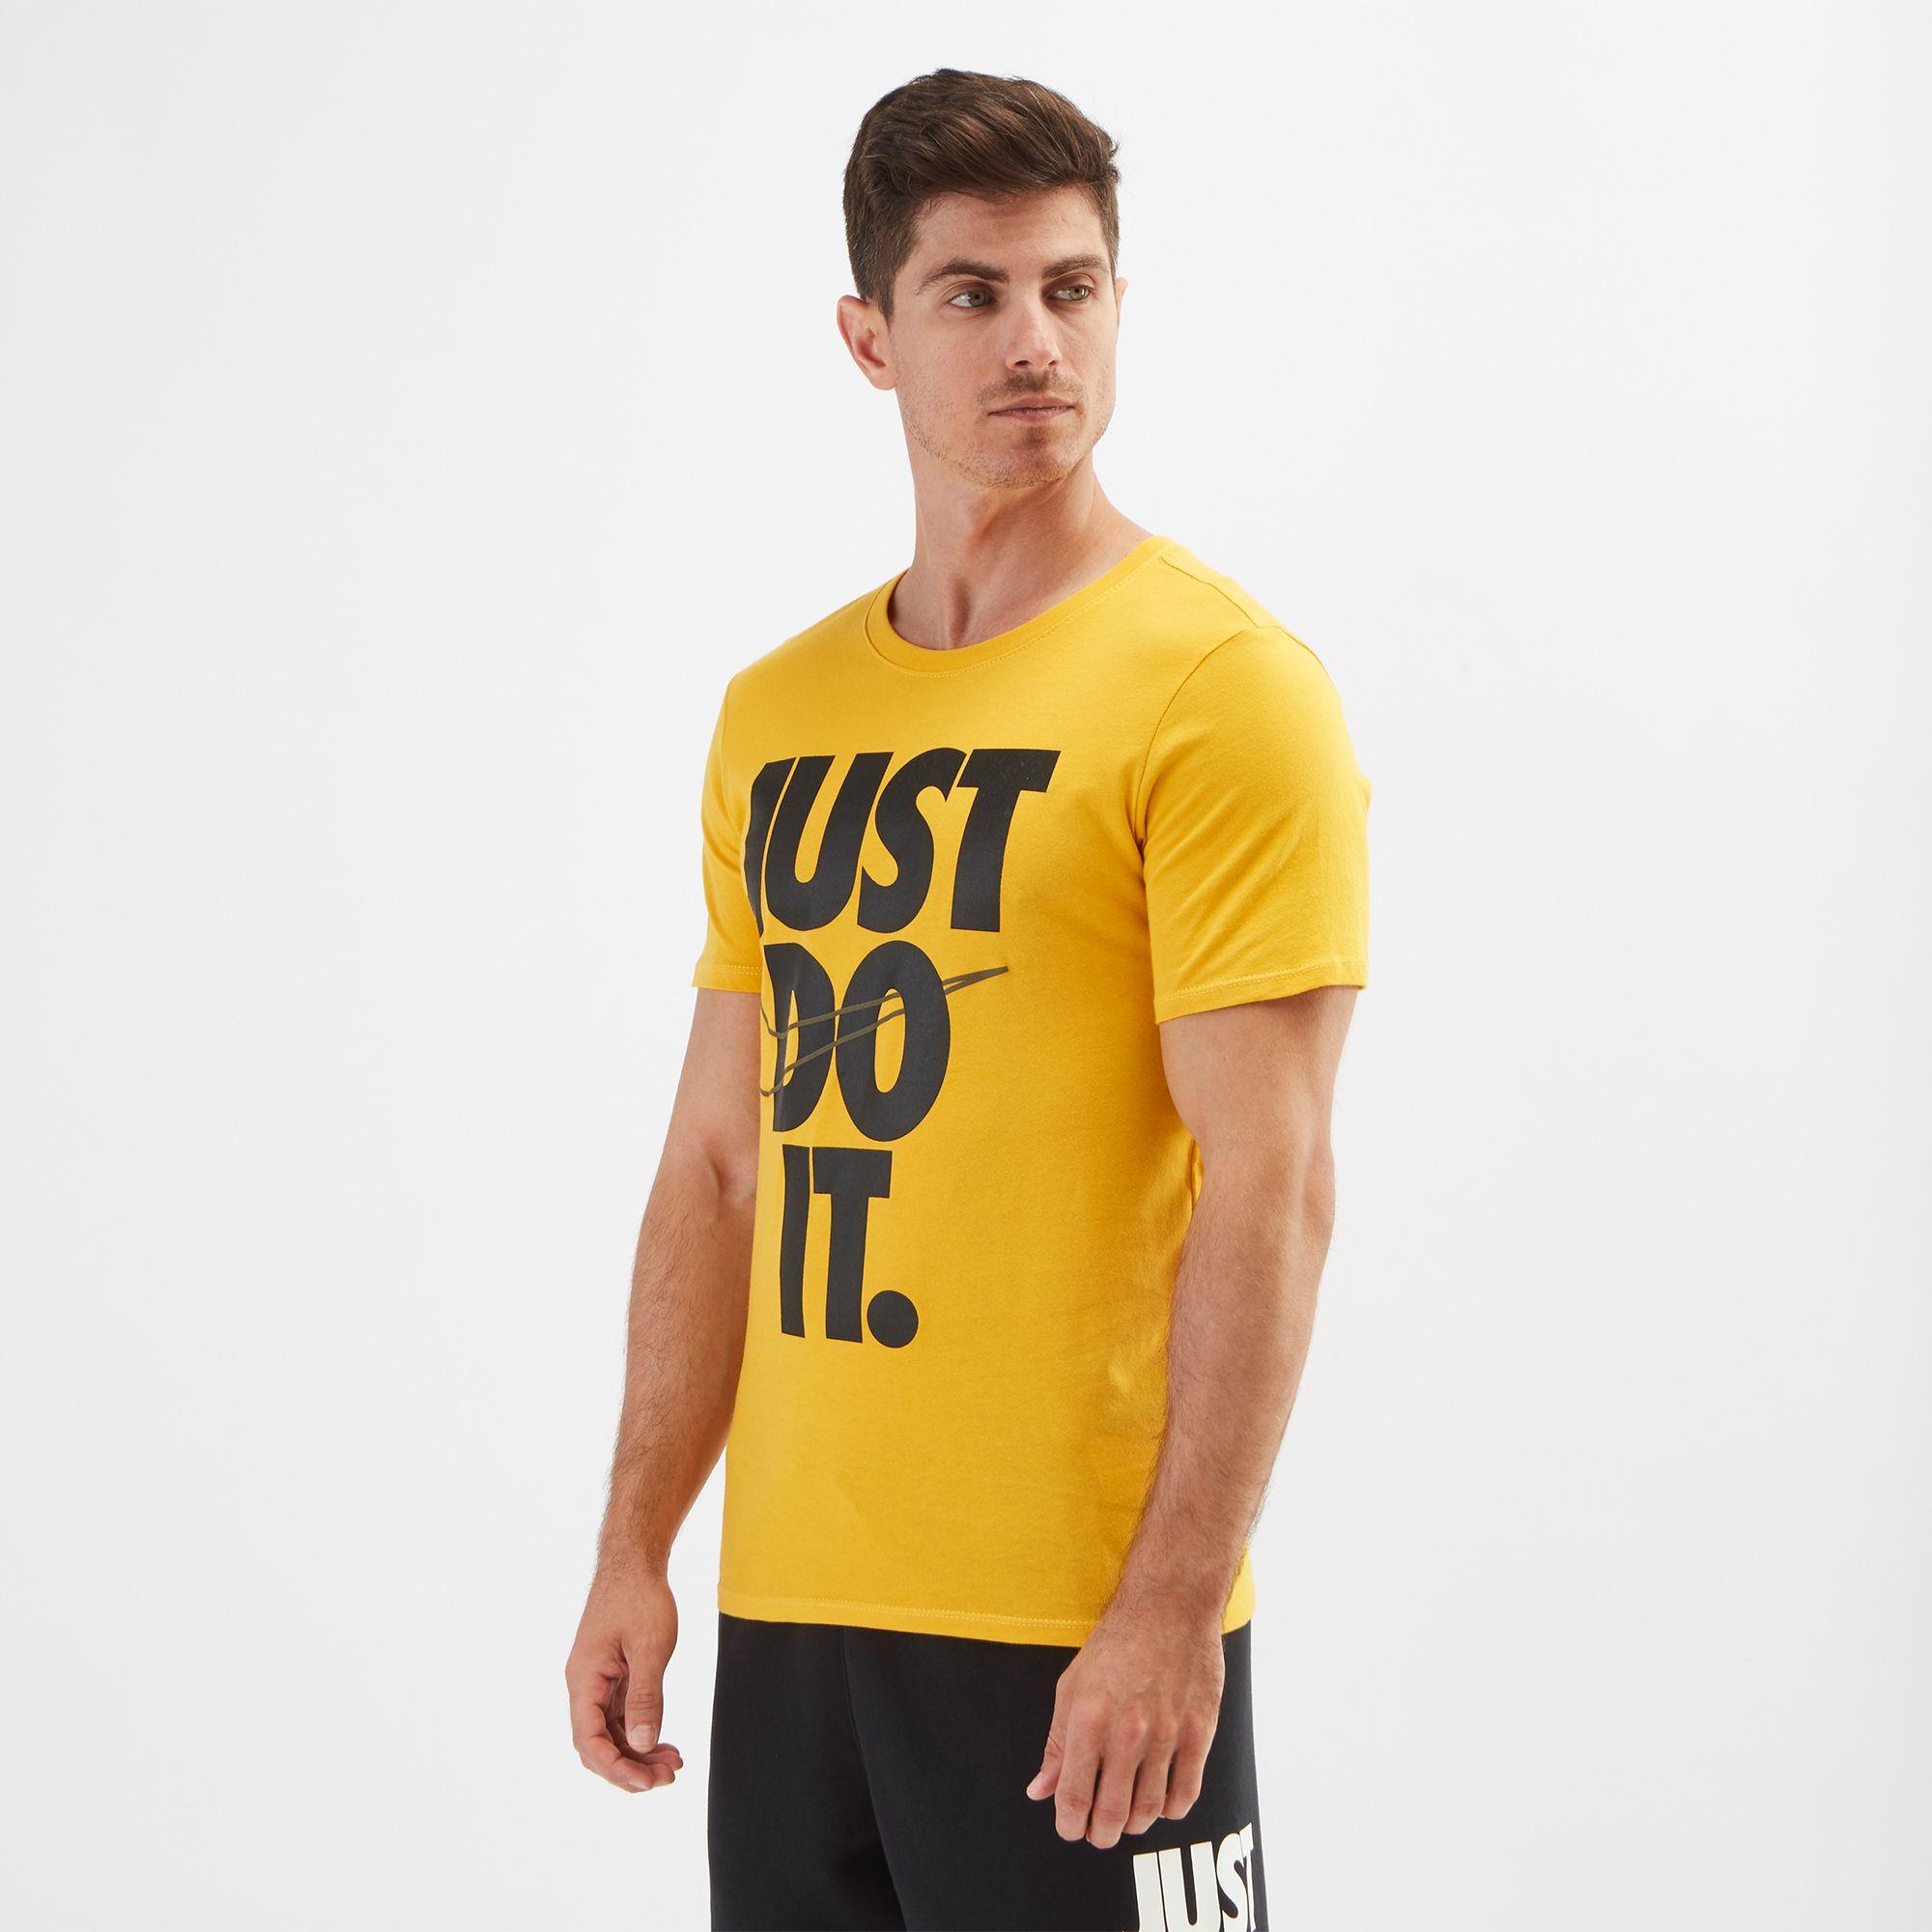 nike sportswear yellow shirt